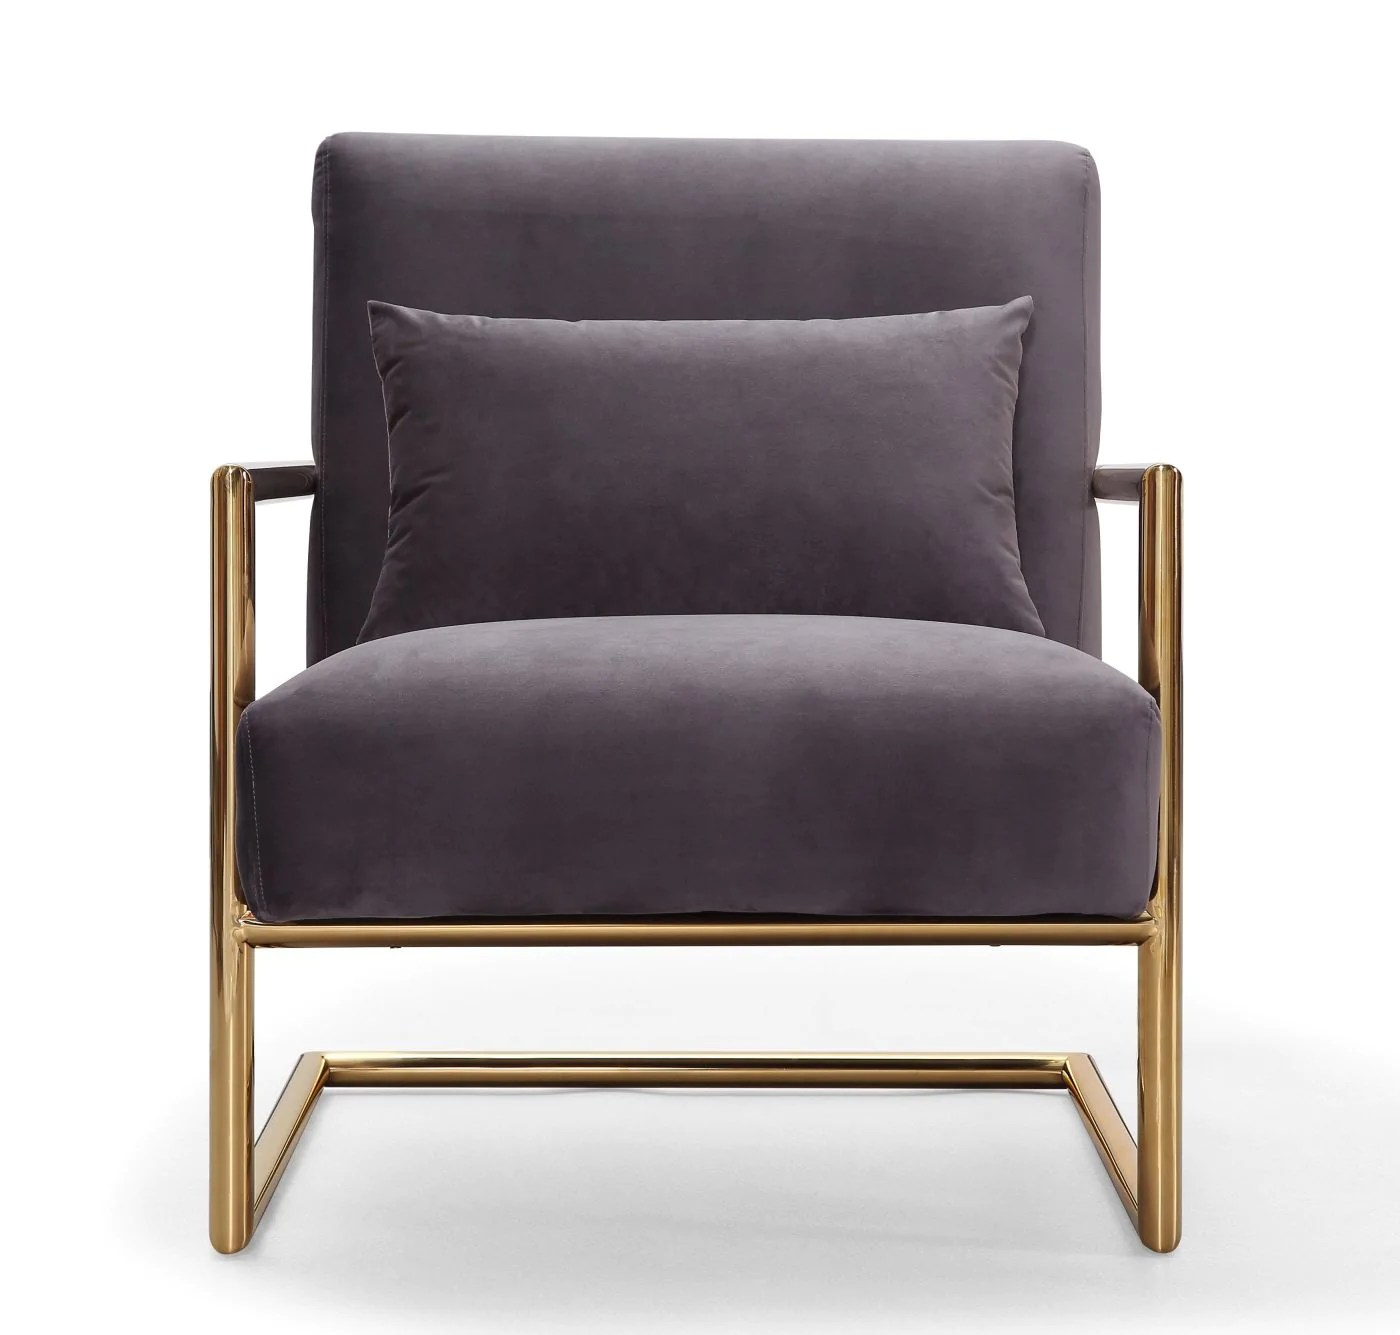 steel chair gold vintage designer chairs tov furniture s6142 elle grey velvet